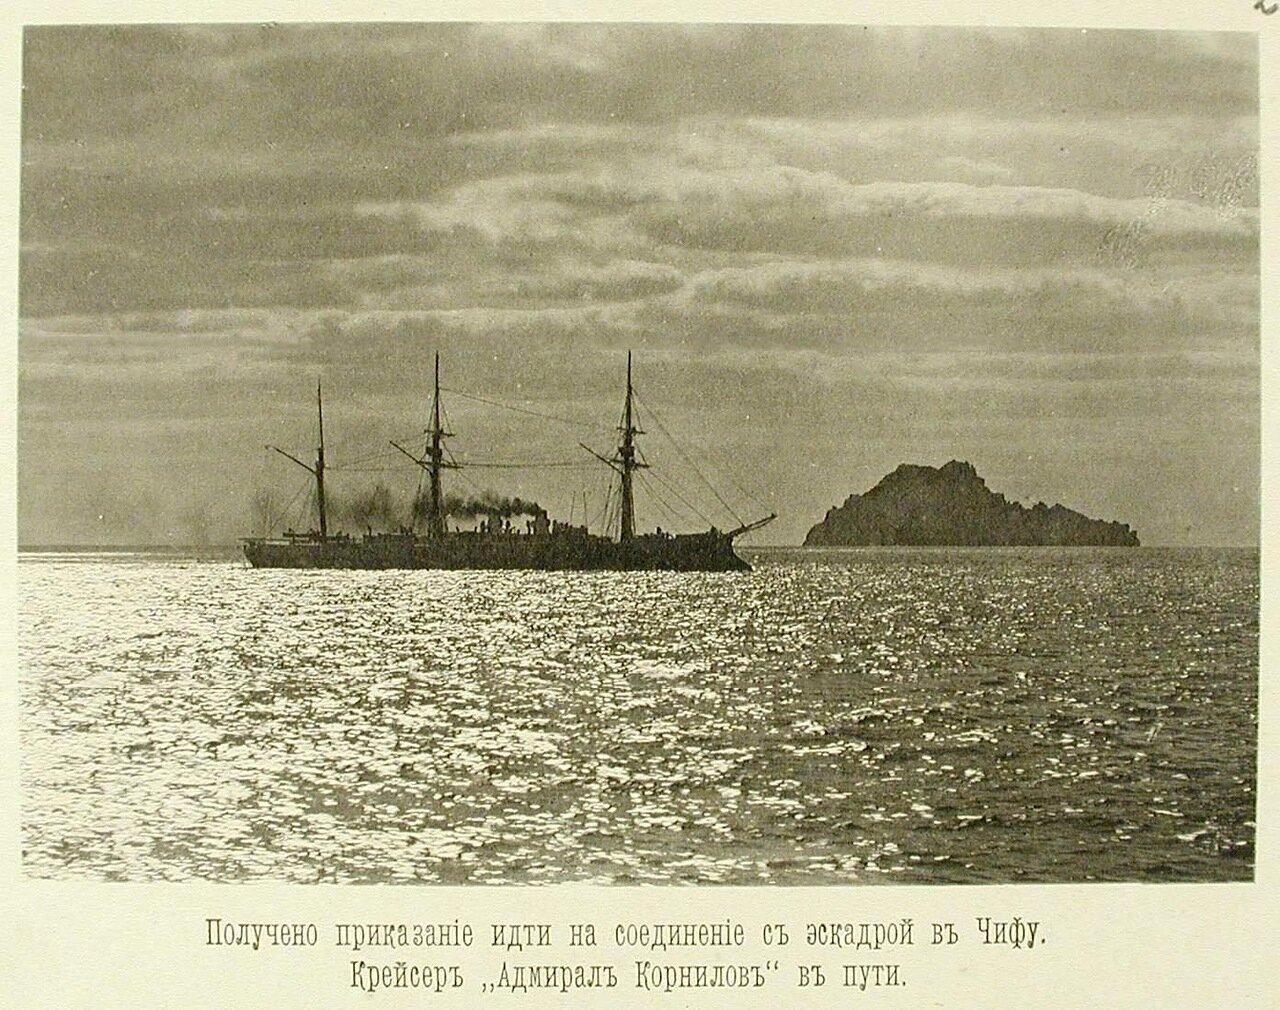 02. Крейсер 1-го ранга Адмирал Корнилов на пути в Чифу. 20-26 апреля 1895